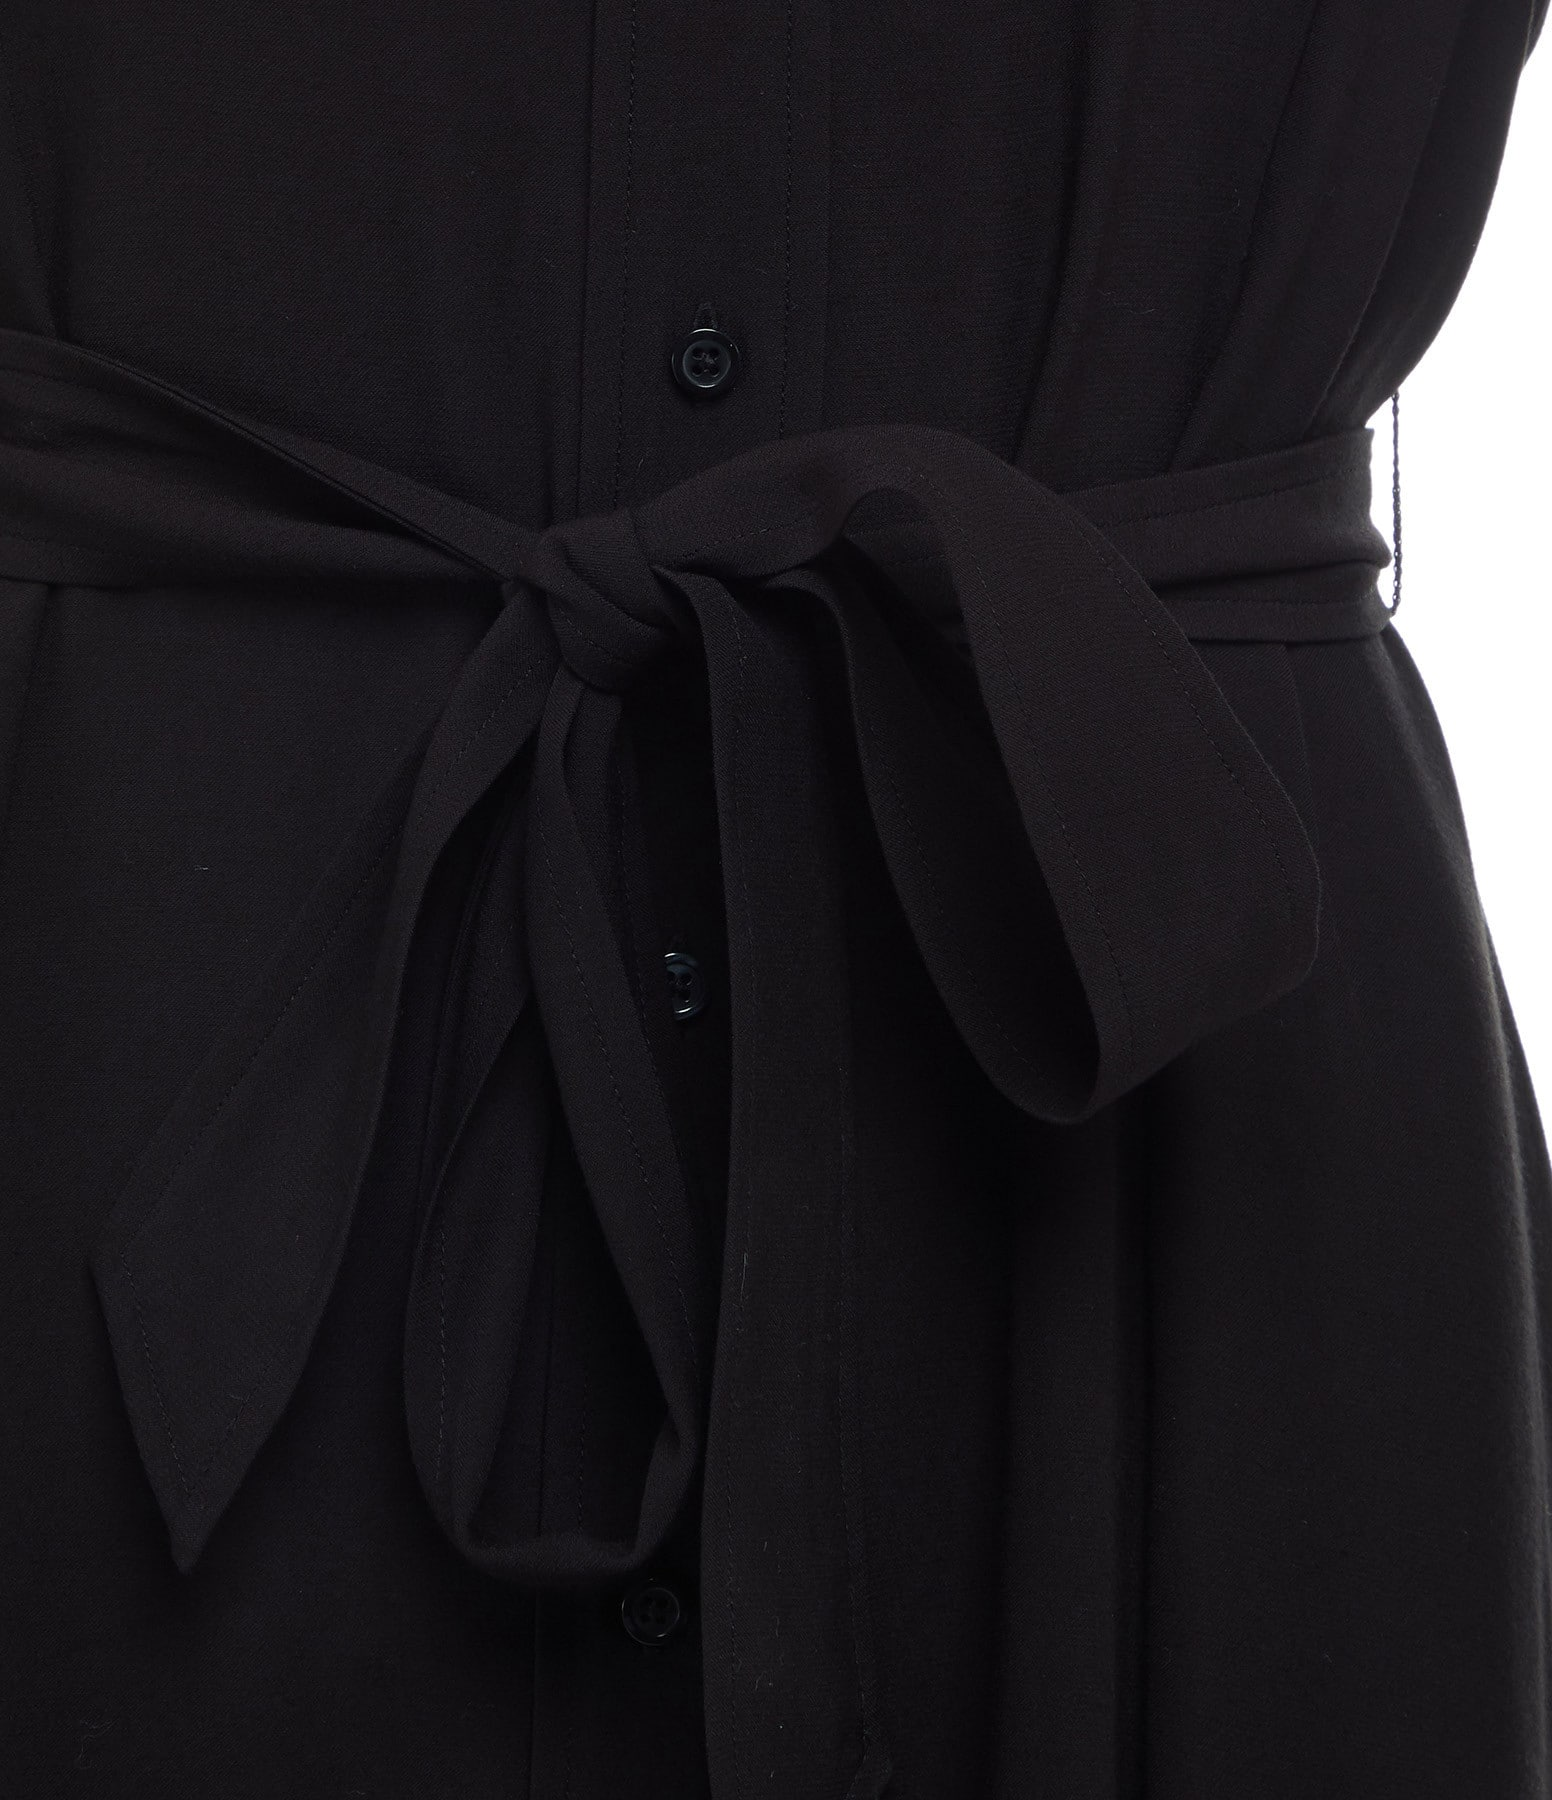 MAISON STANDARDS - Robe Chemise Longue Noir